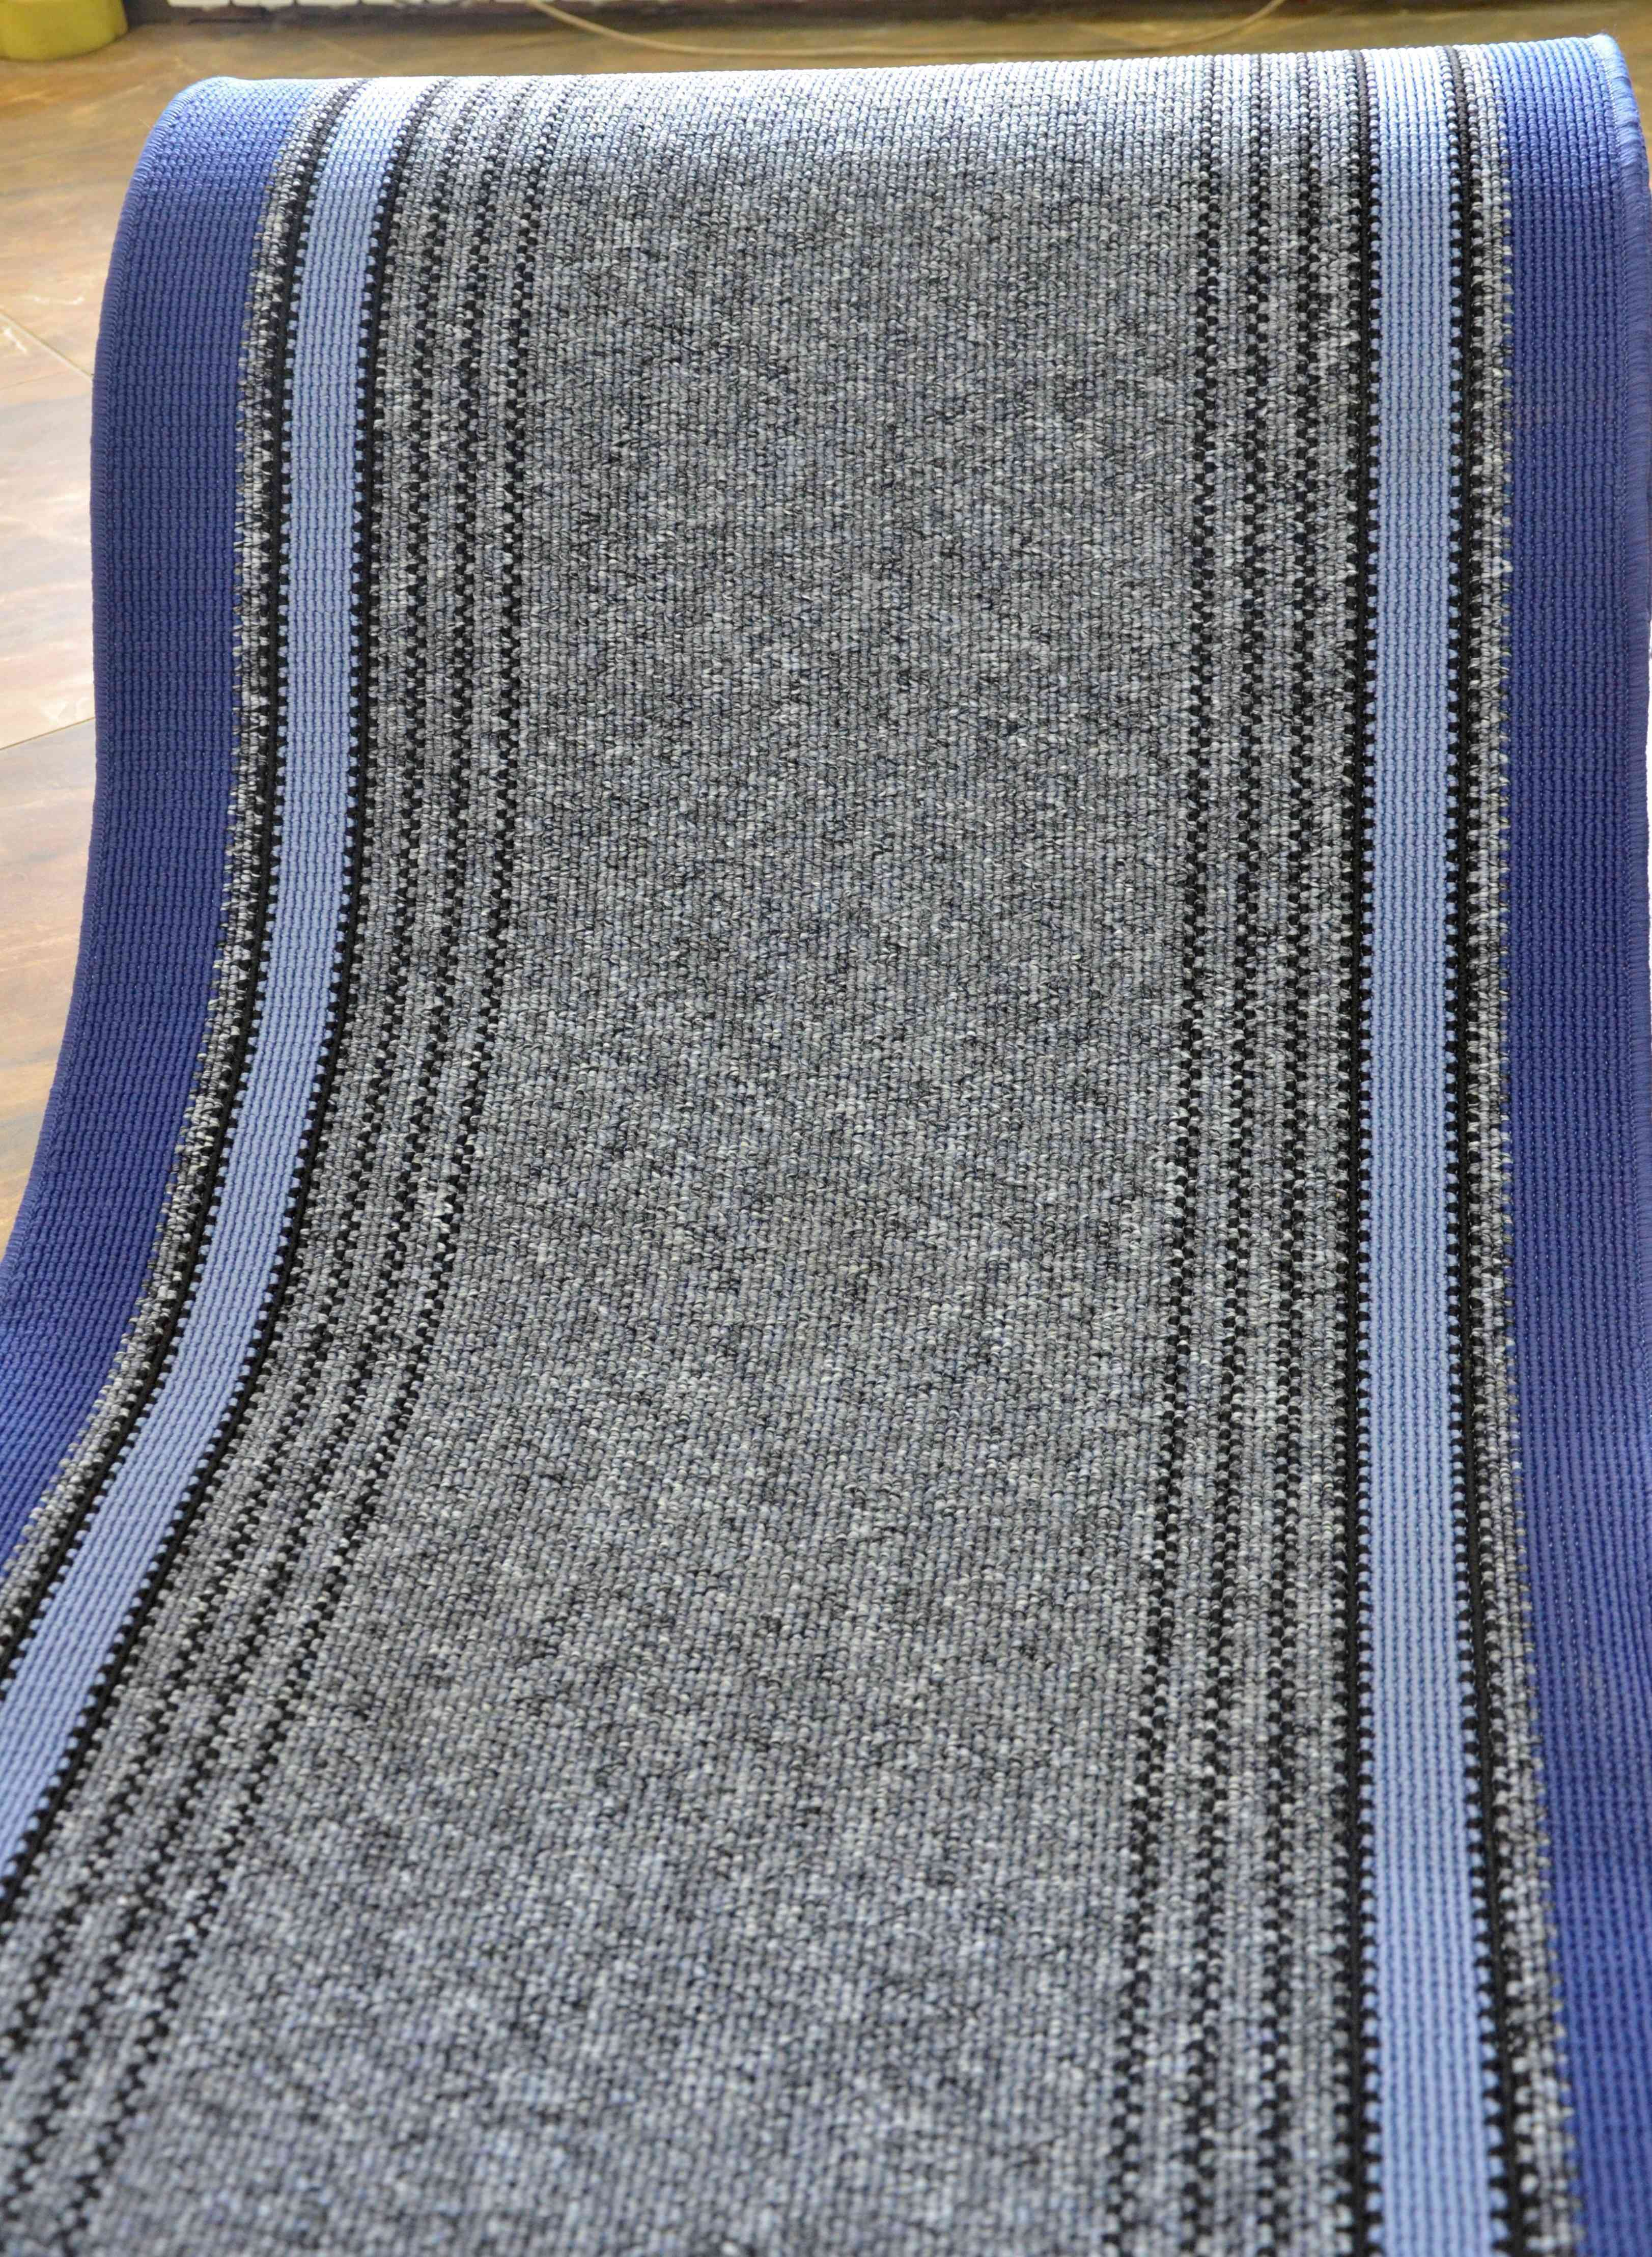 Traversa Covor, Saba 08, Albastru, 100x600 cm, 1350 gr/mp, 1x6 m 4